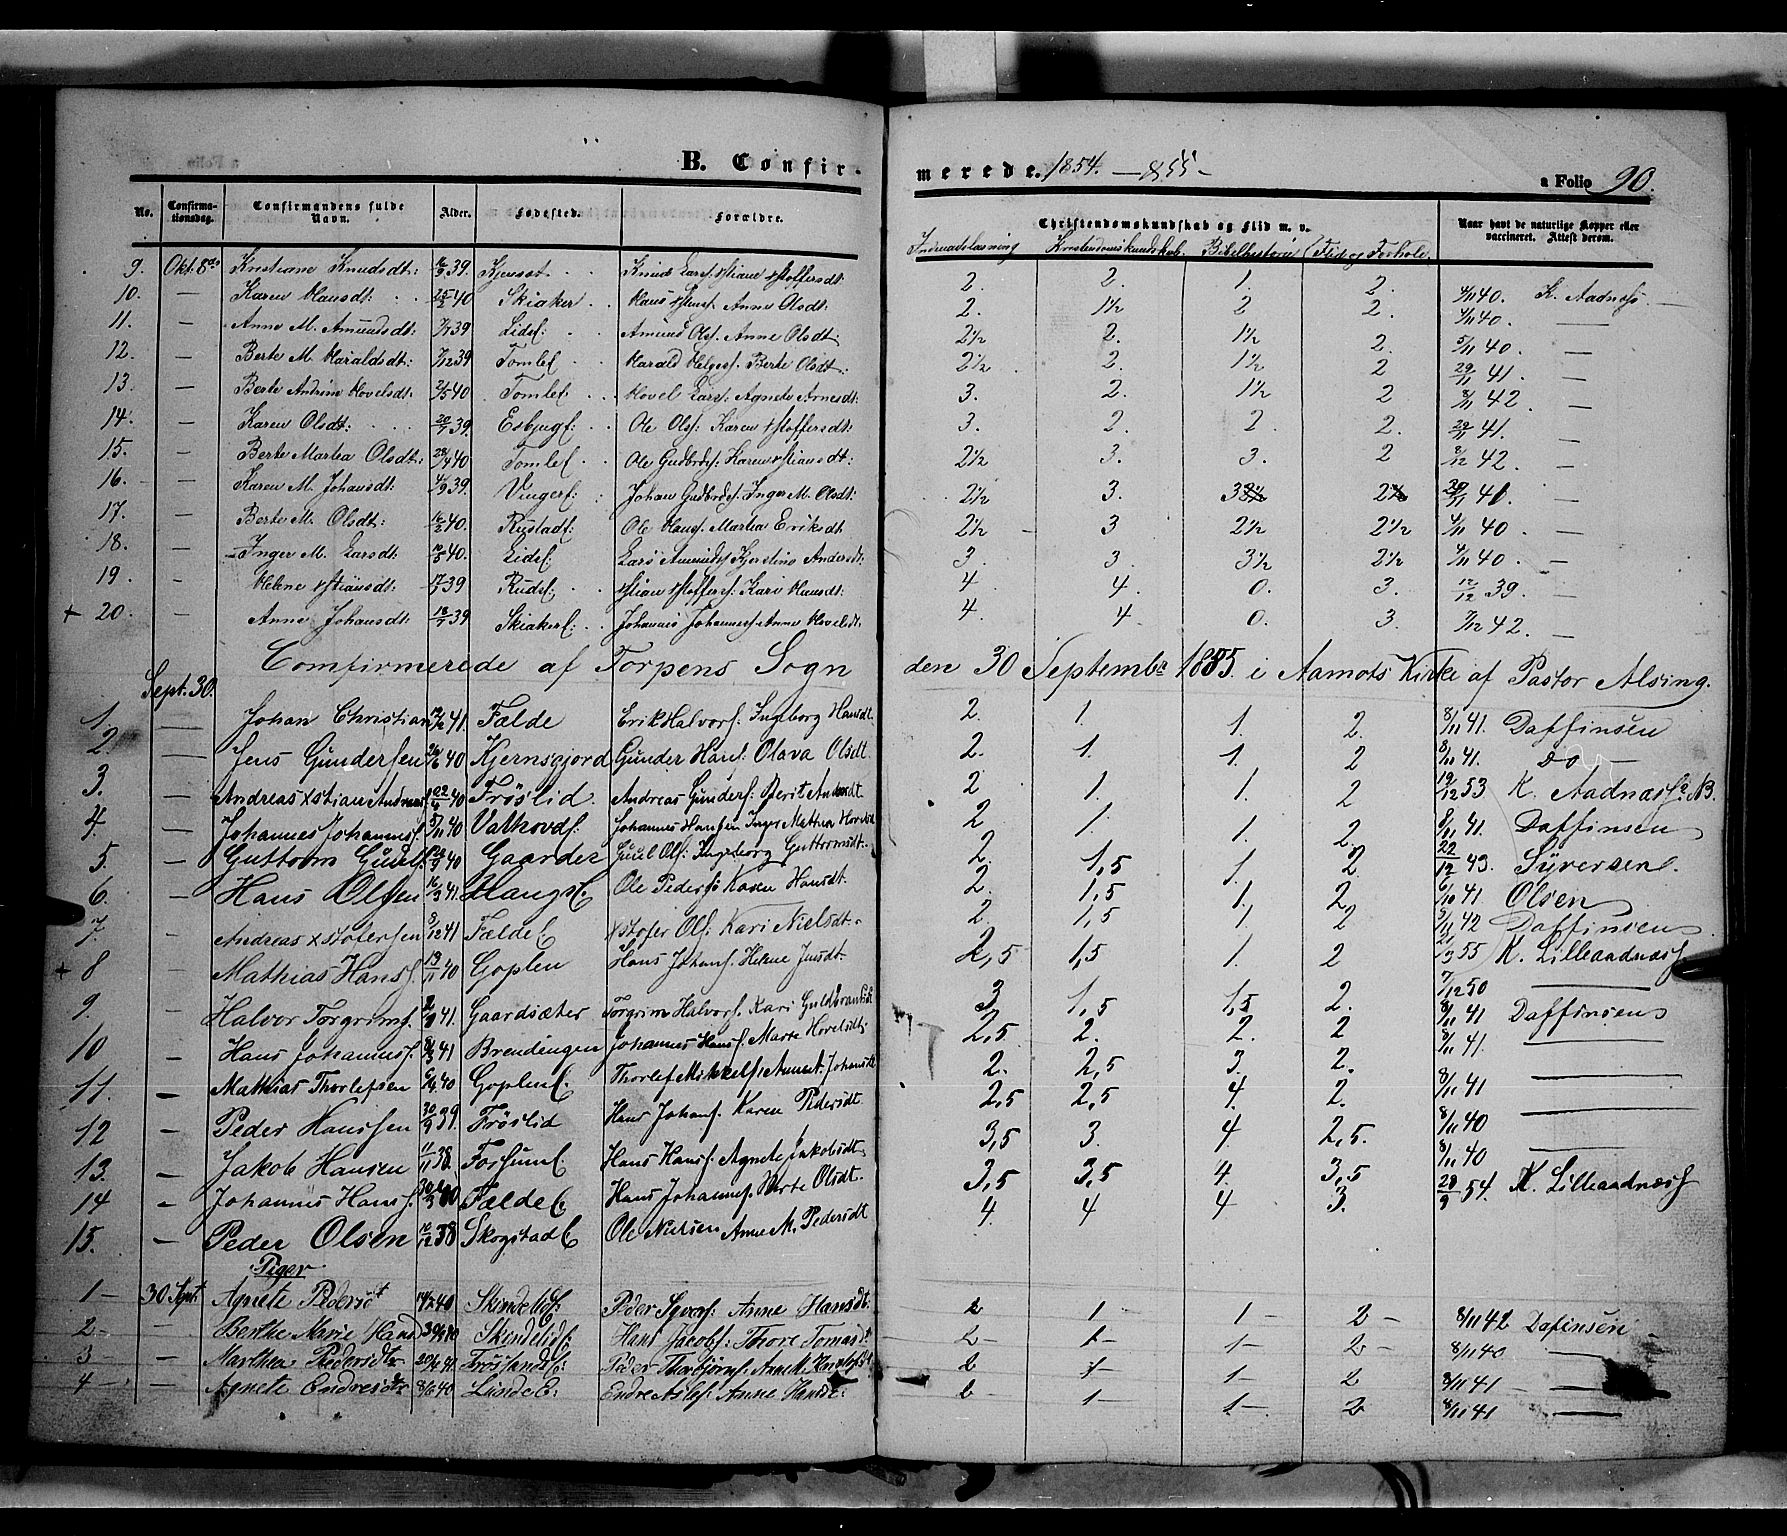 SAH, Land prestekontor, Ministerialbok nr. 10, 1847-1859, s. 90